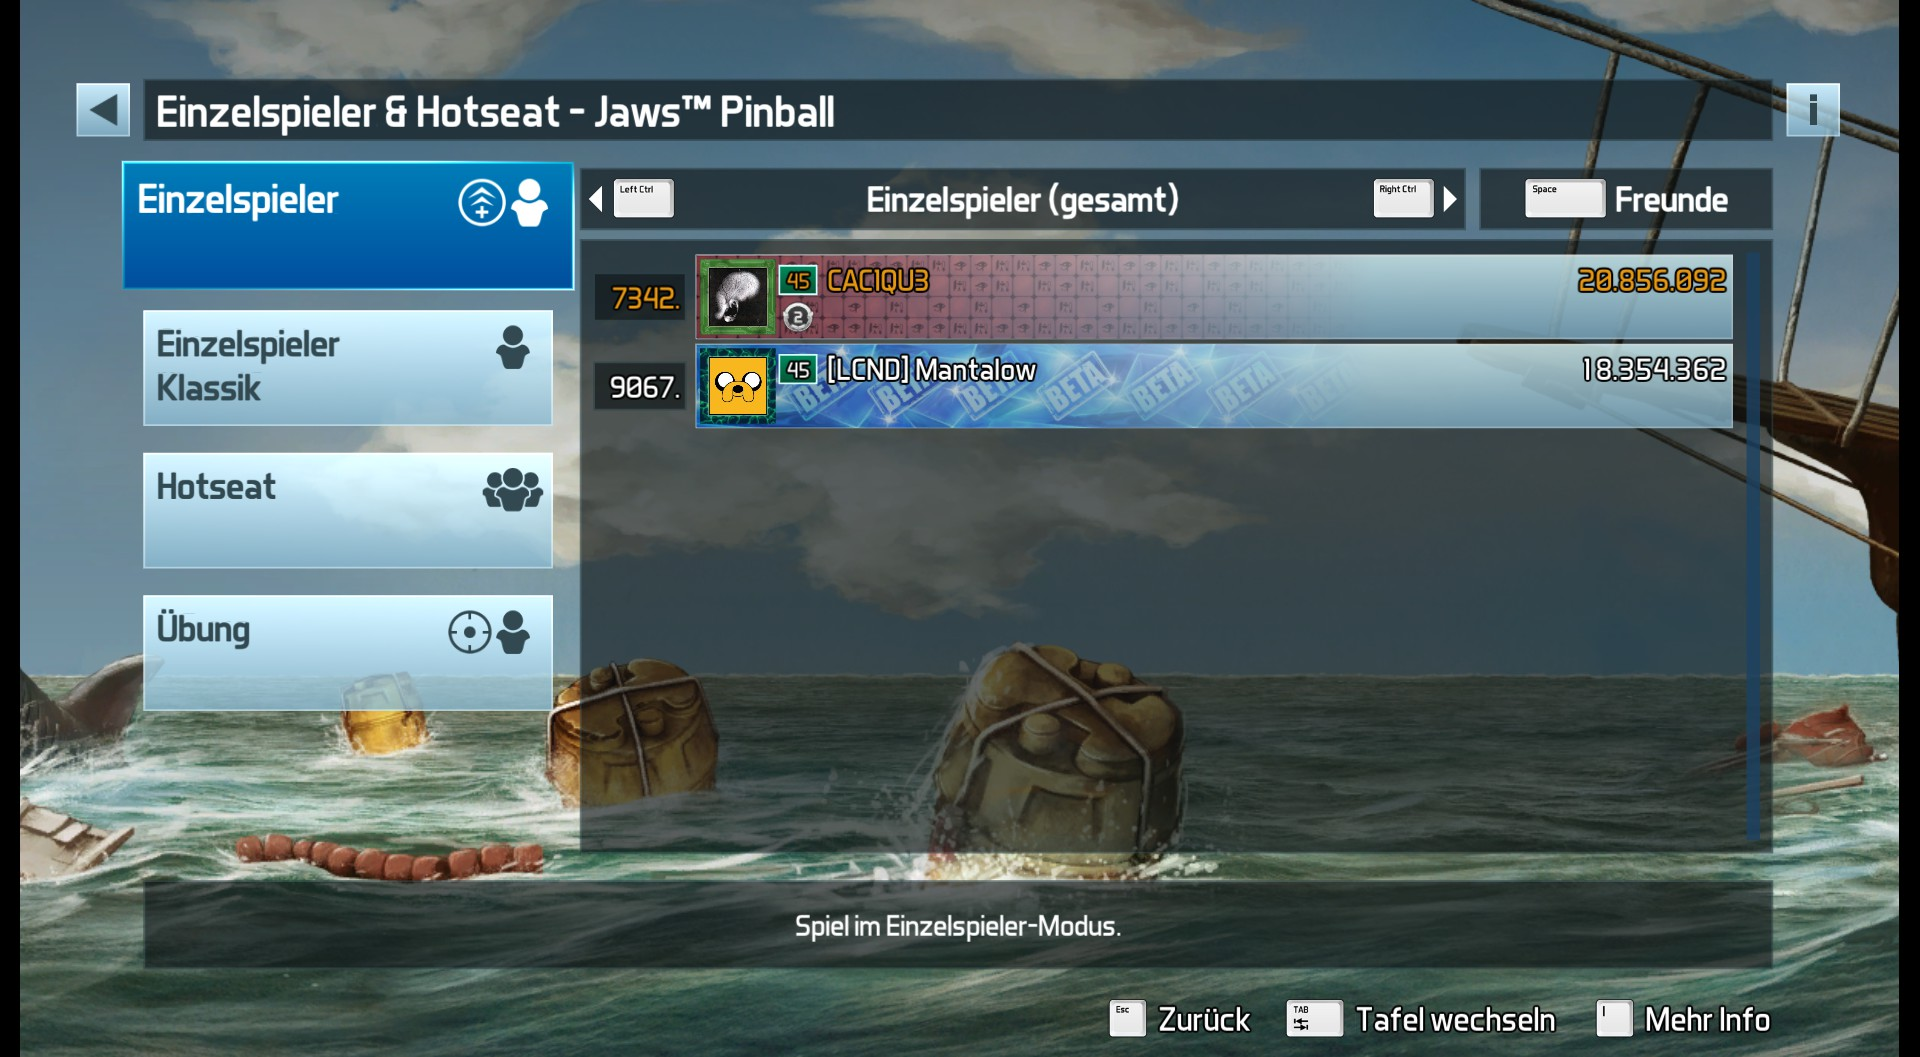 Pinball FX3: Jaws Pinball 20,856,092 points